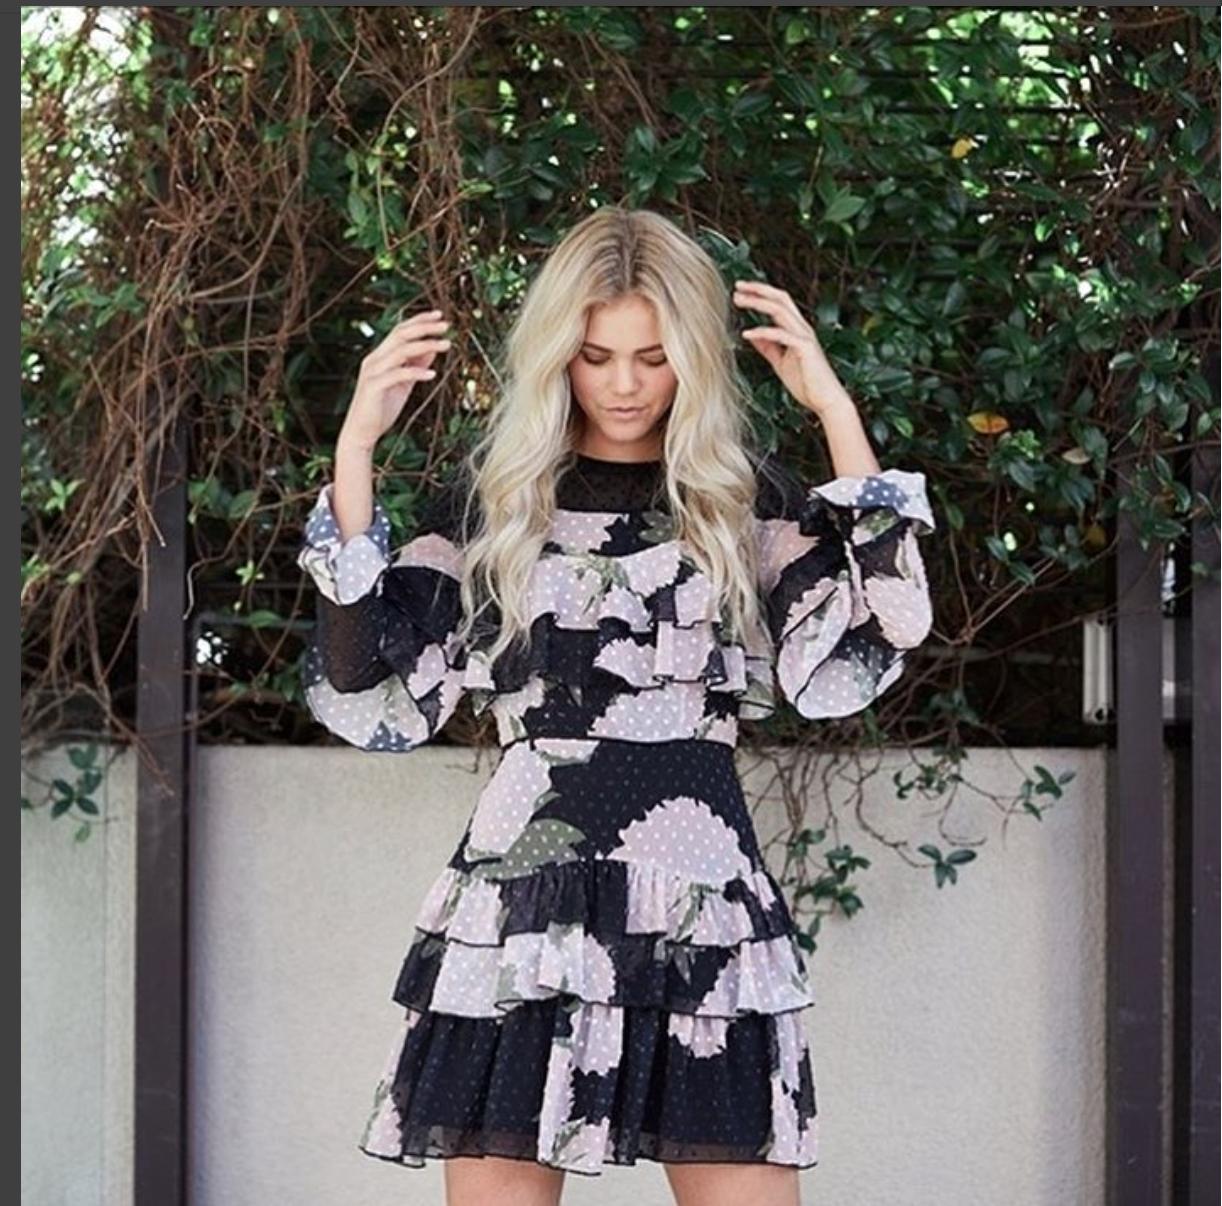 Dress: Tallulah